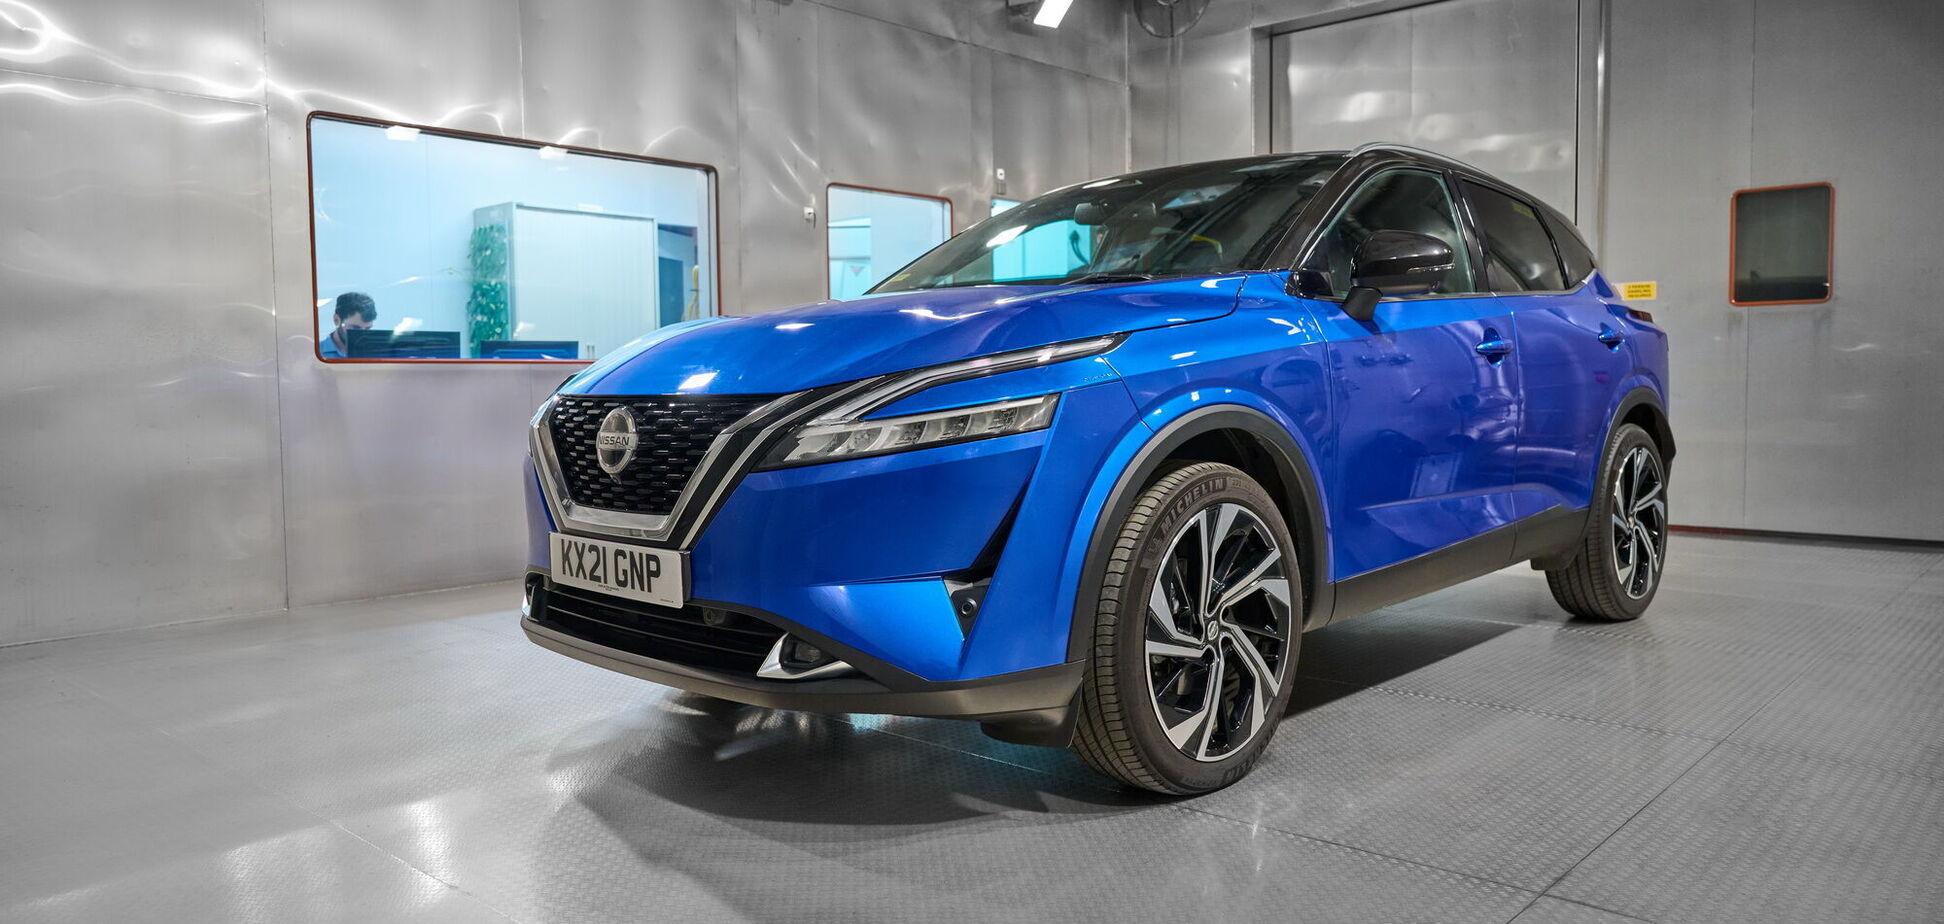 Кроссоверу Nissan Qashqai надали 'запах нового авто'